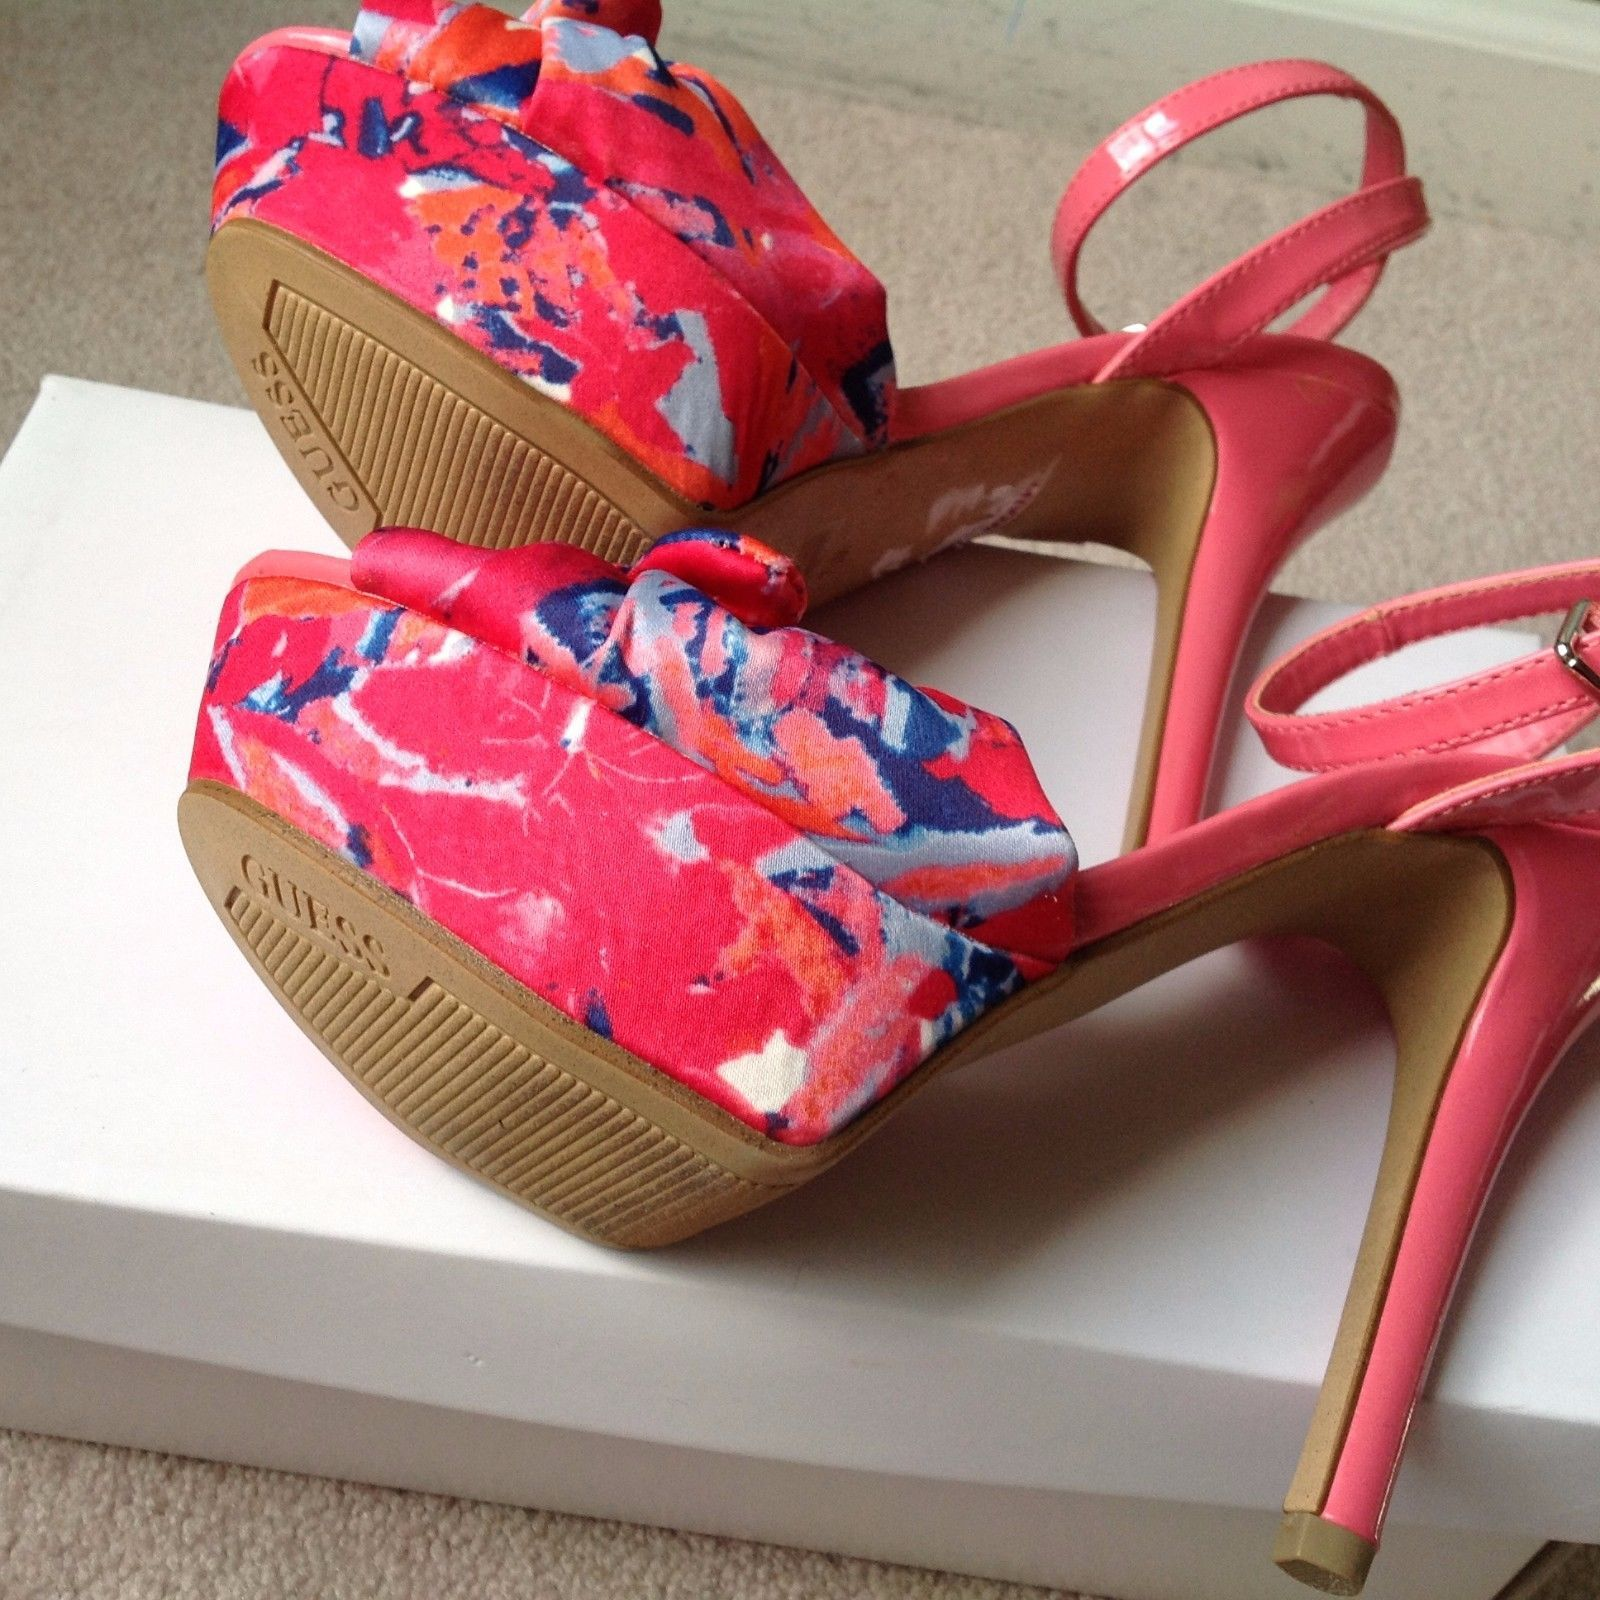 41896e2da ... GUESS Women s Pink Ankle Strap Platform Bow Heels Sandals Size 7.5 New